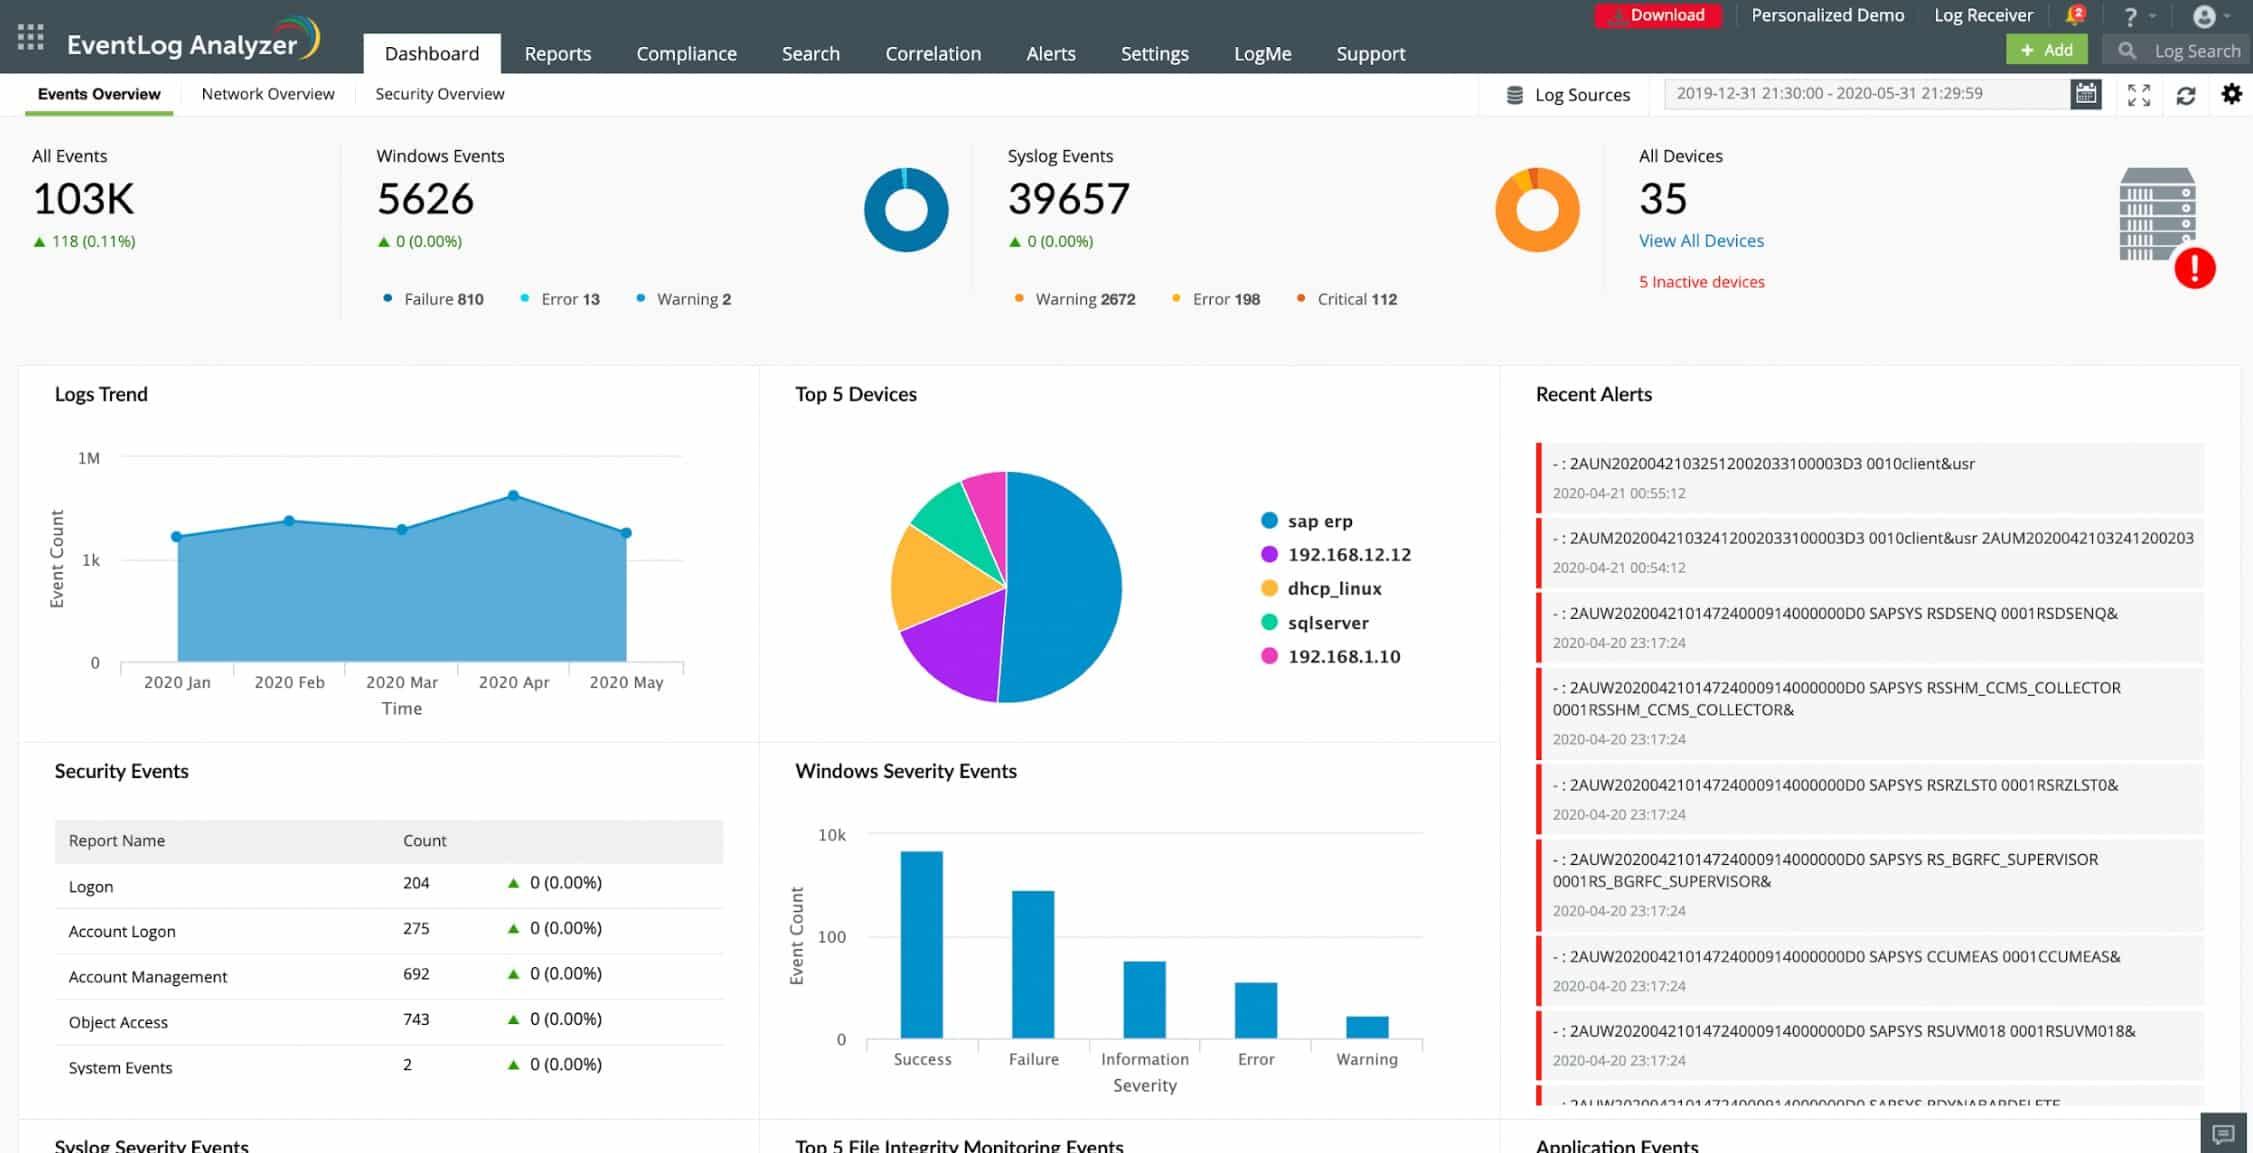 ManageEngine EventLog Analyzer File Integrity Monitoring Templates